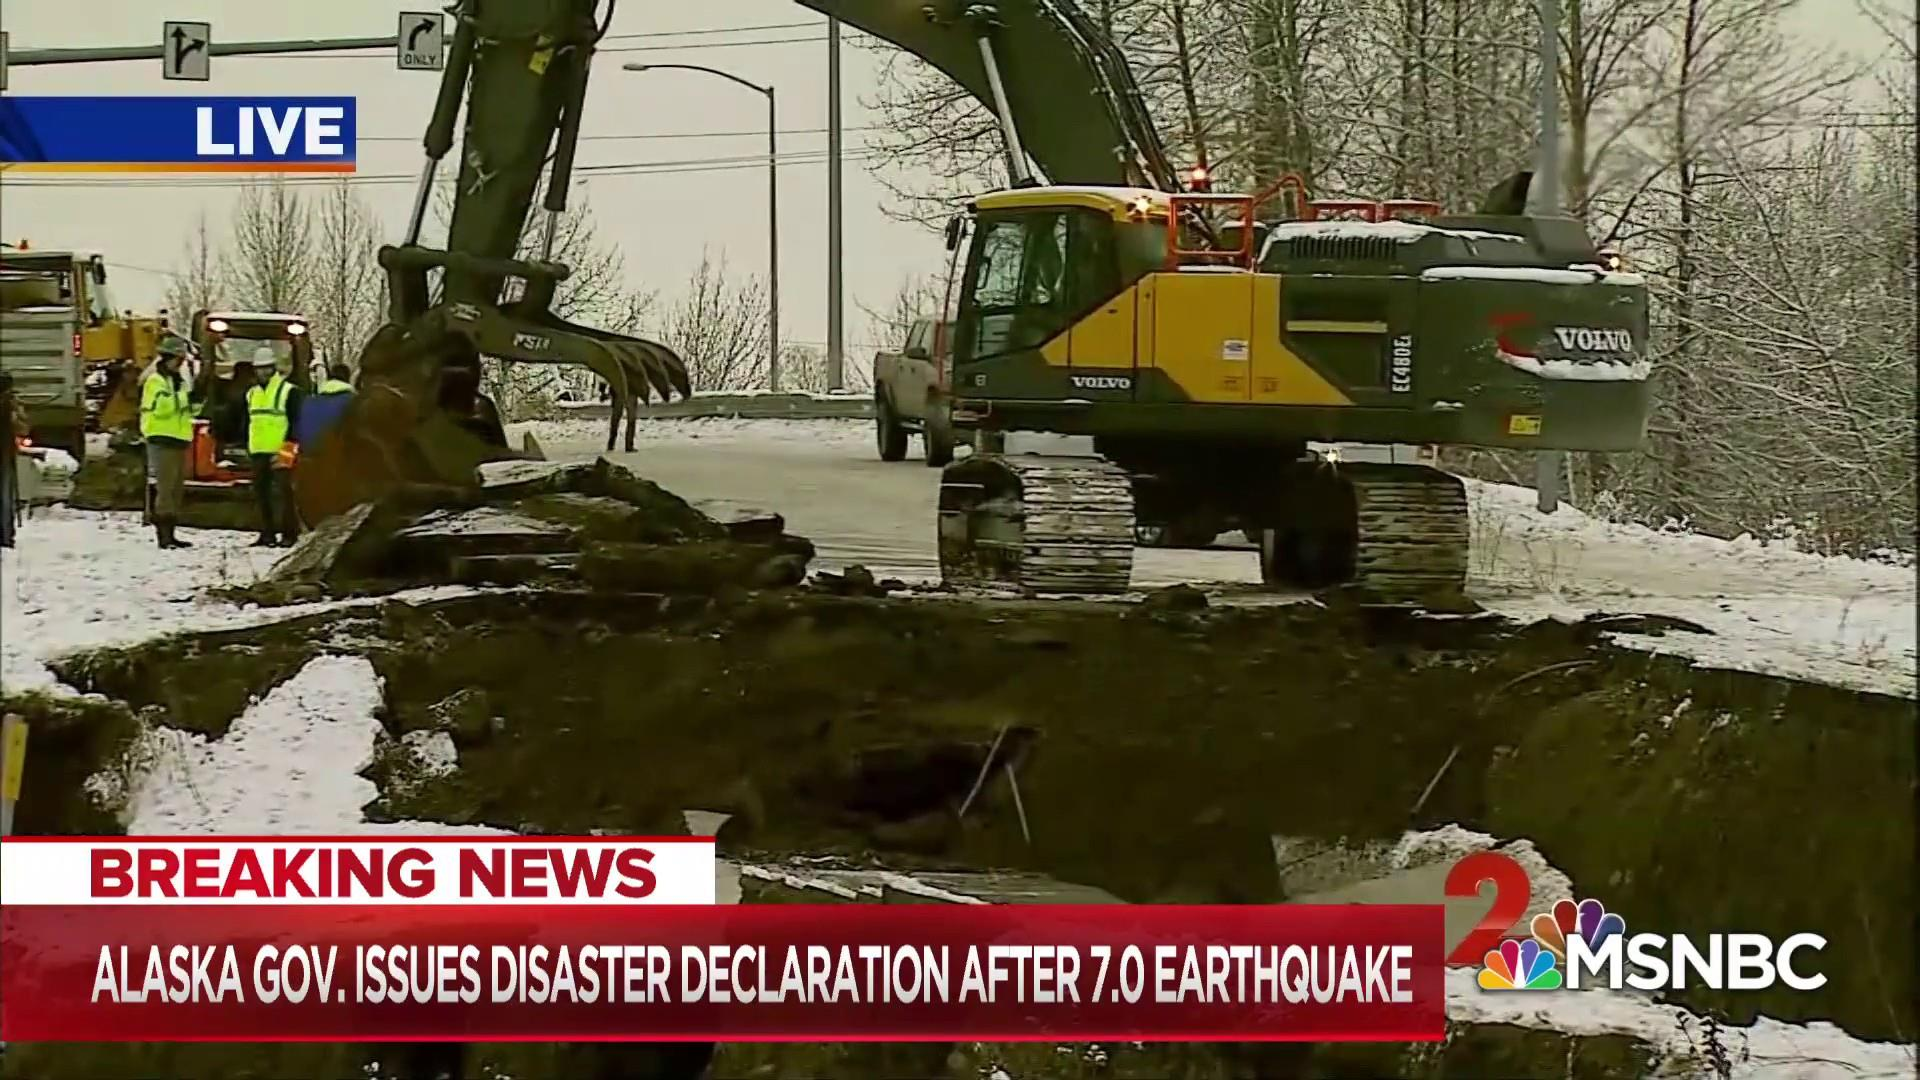 Massive earthquake leaves Alaska infrastructure in shambles